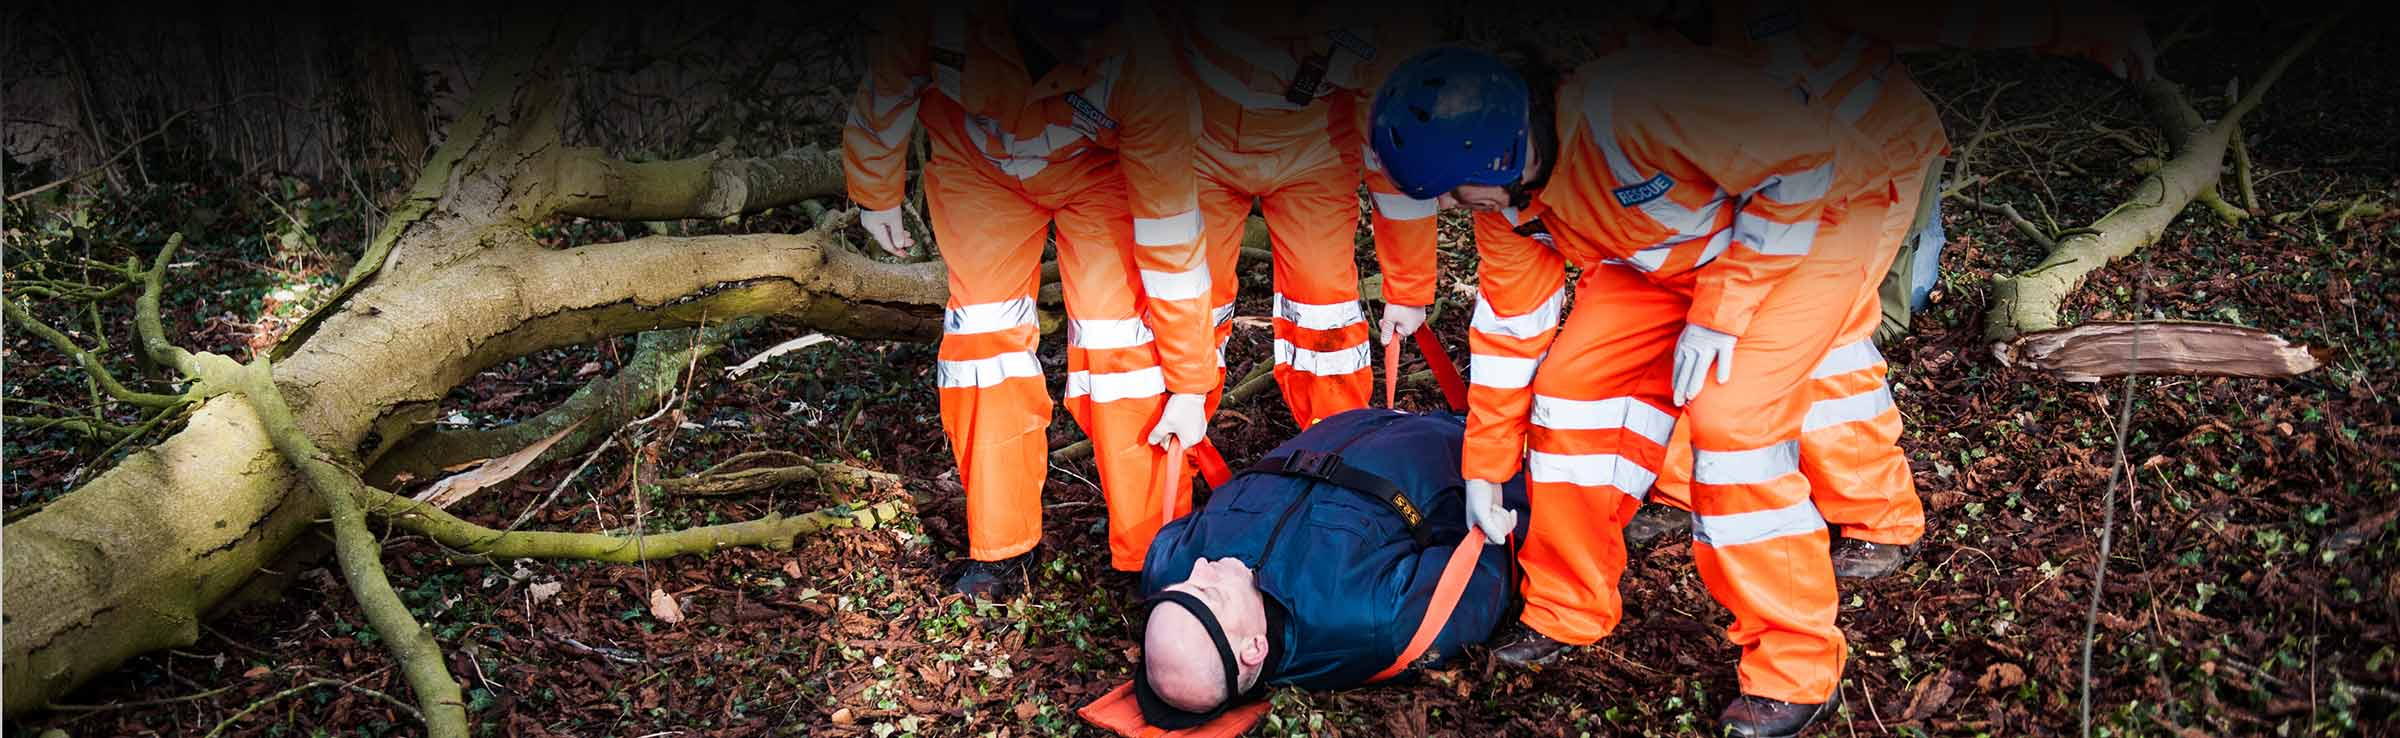 stretcher for survival light portable micro-stretcher